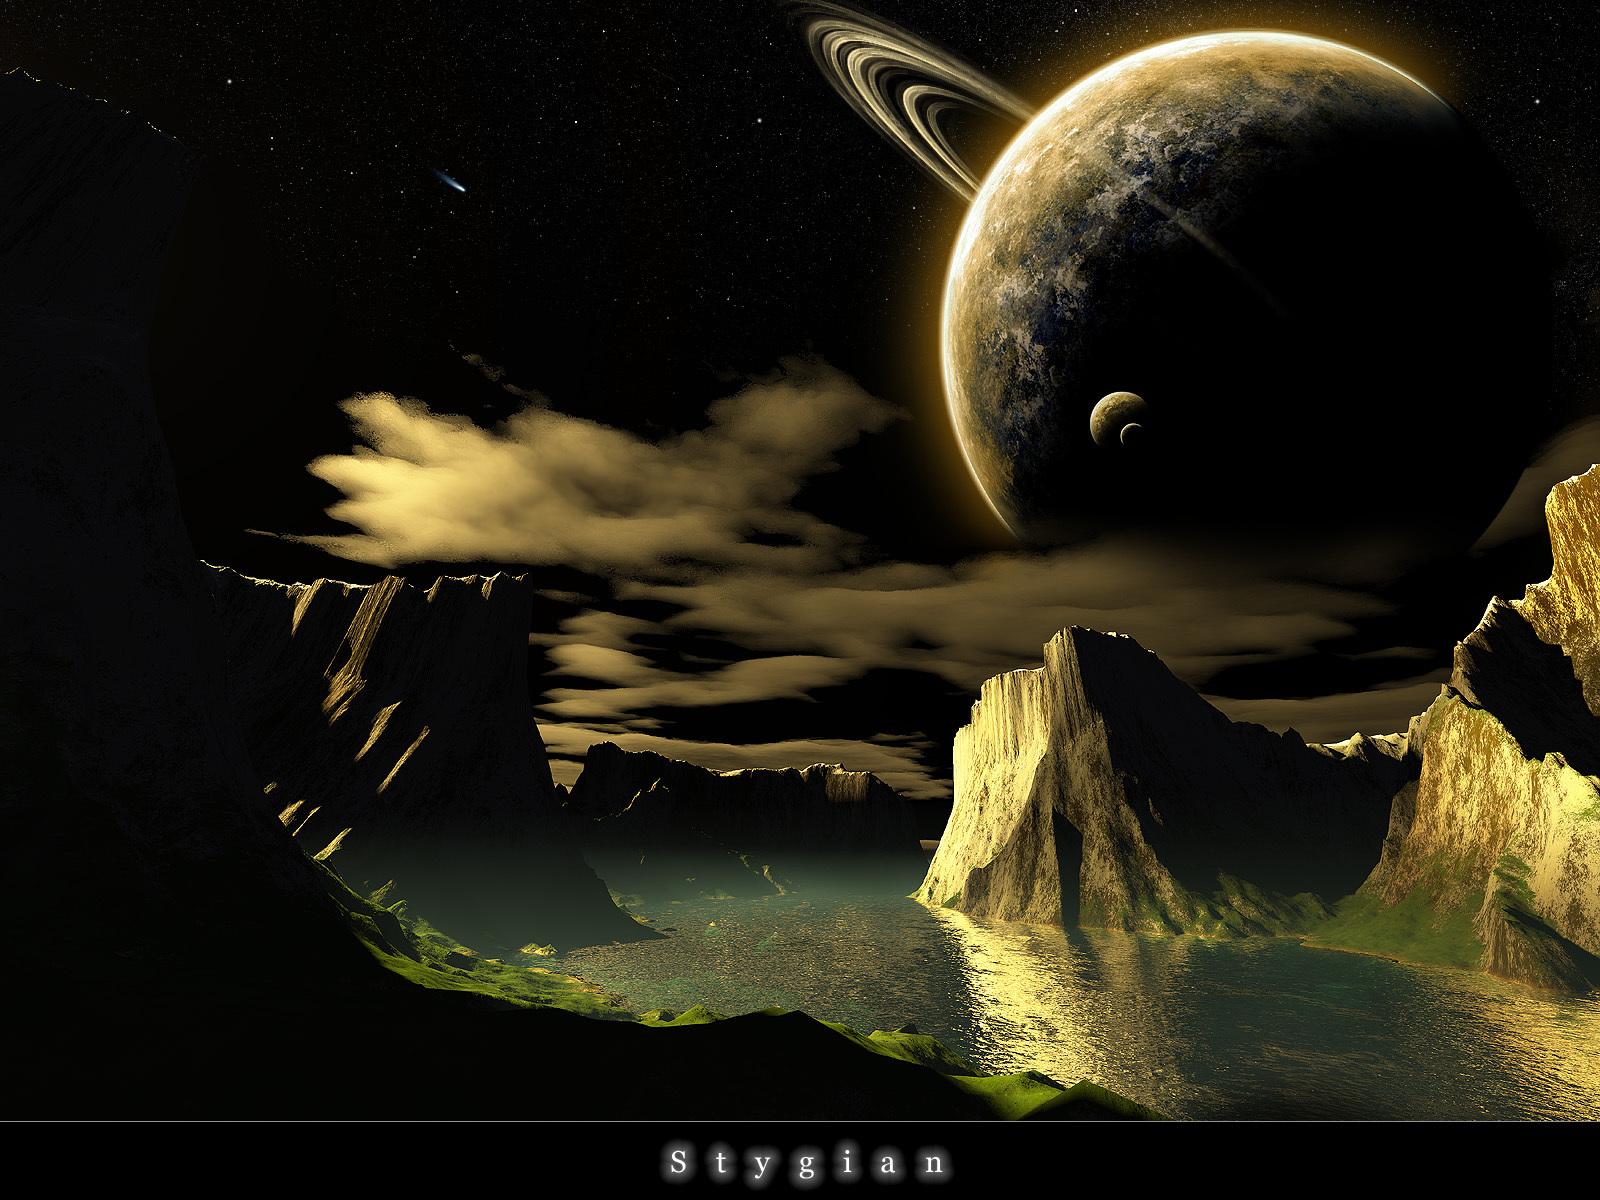 Space Demonic Art Hd Wallpaper: Space Art HD Wallpaper